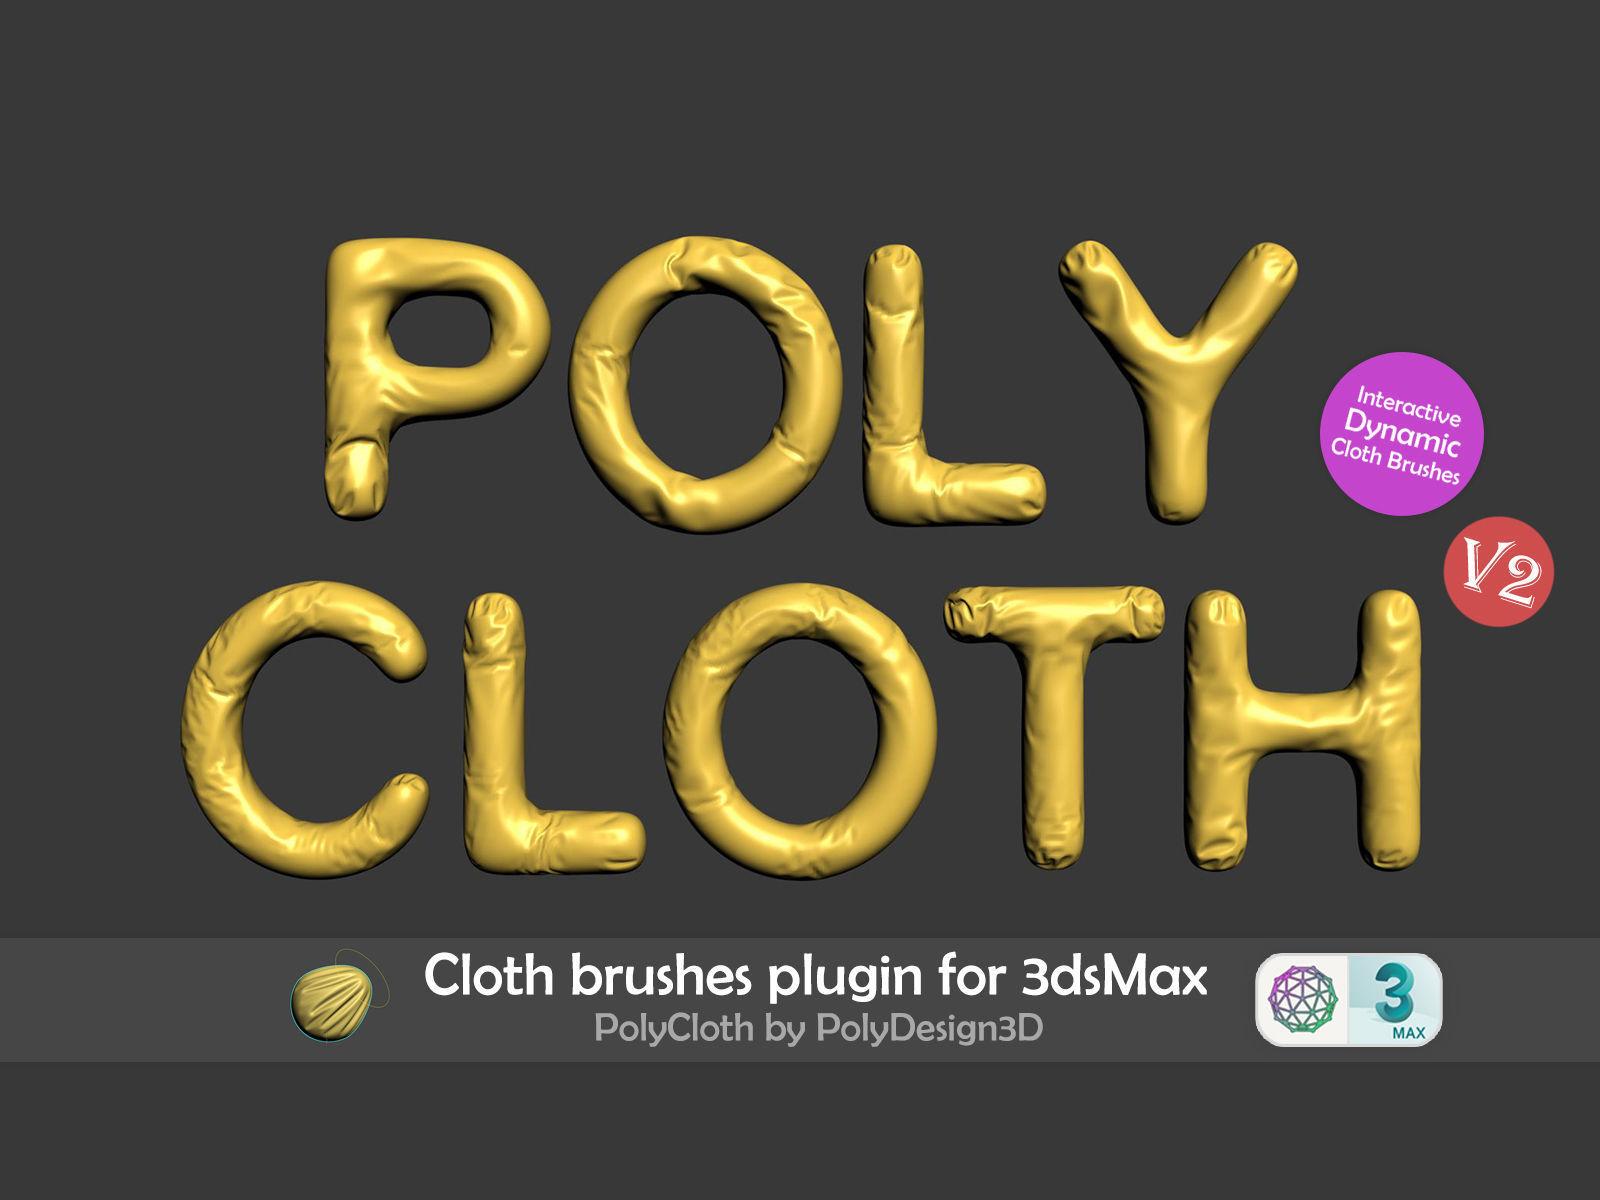 PolyCloth V2 ClothBrush Plugin for 3dsMax